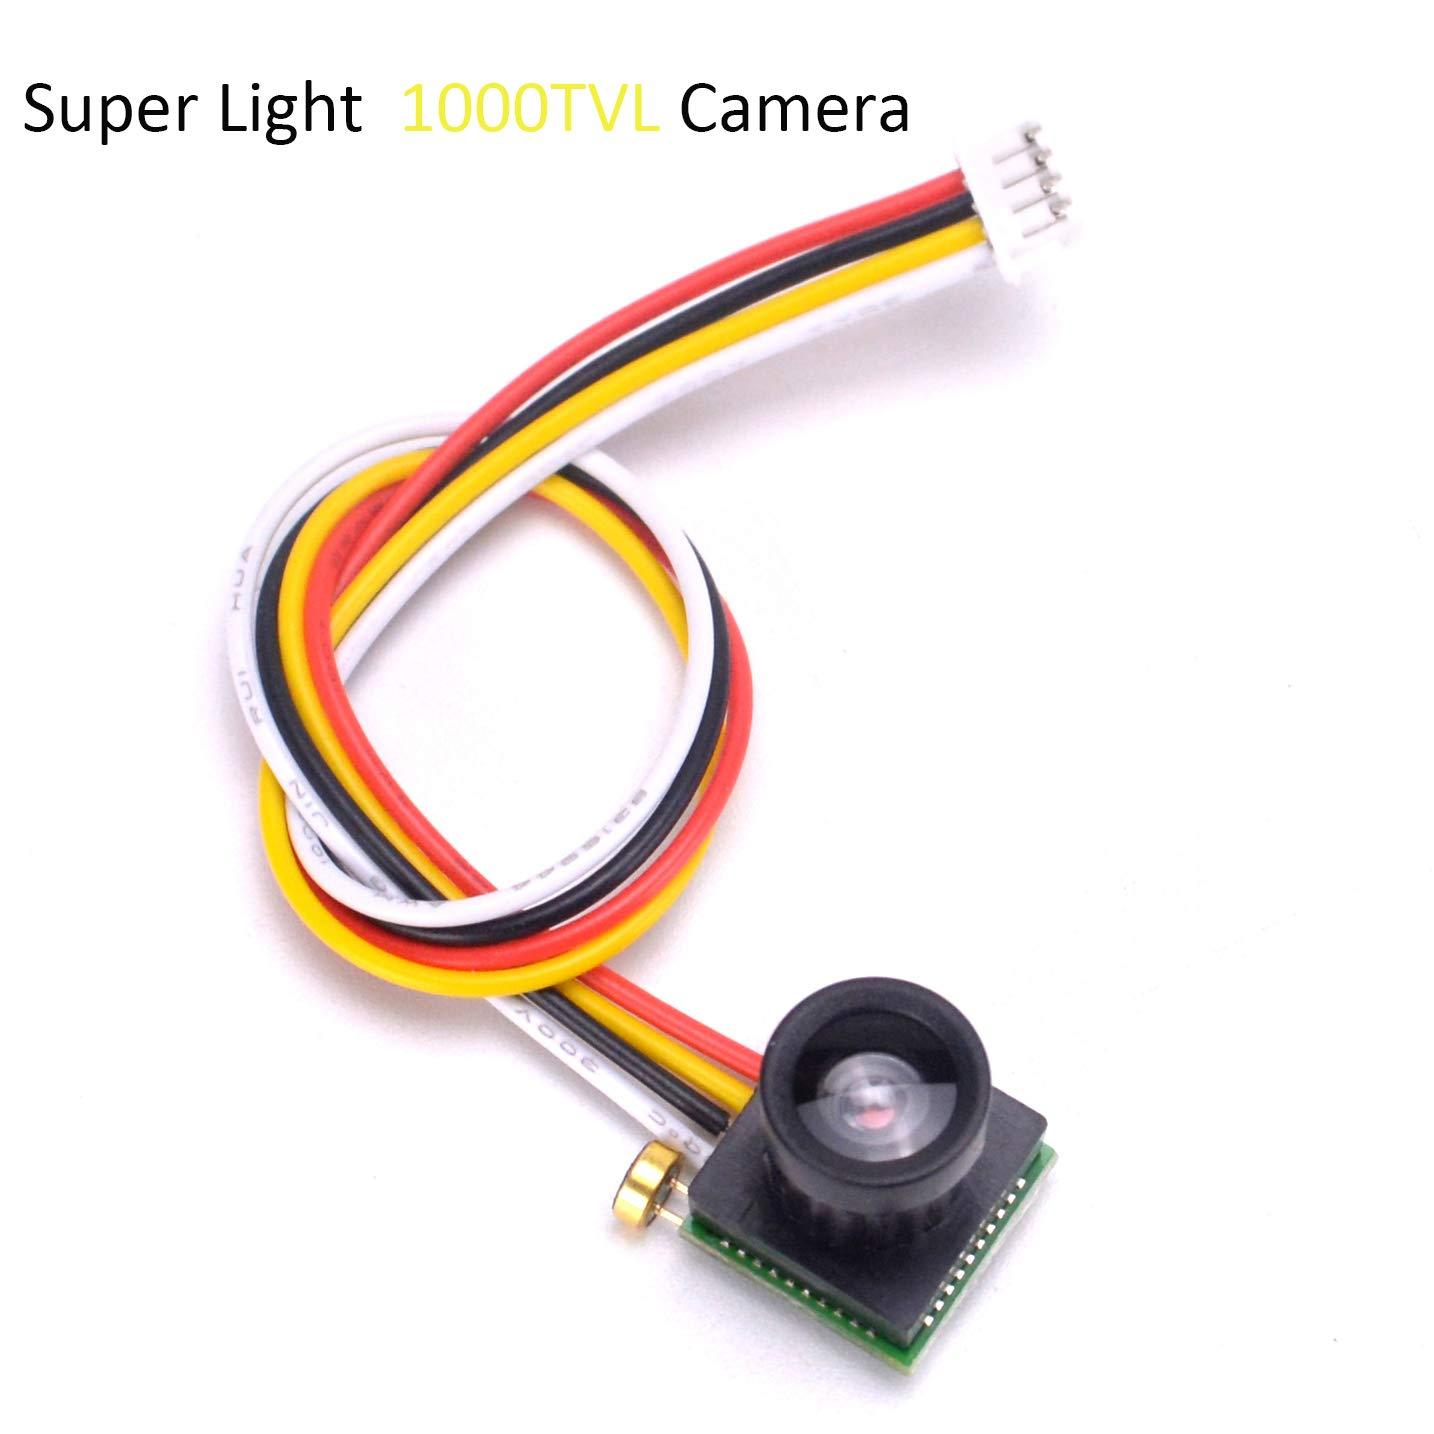 FPVKing Micro 1000TVL FPV Camera 1/4 CMOS 2.8mm Lens Super Light FOV 90 Degree Sensor Mini Camera for RC Racing Drone